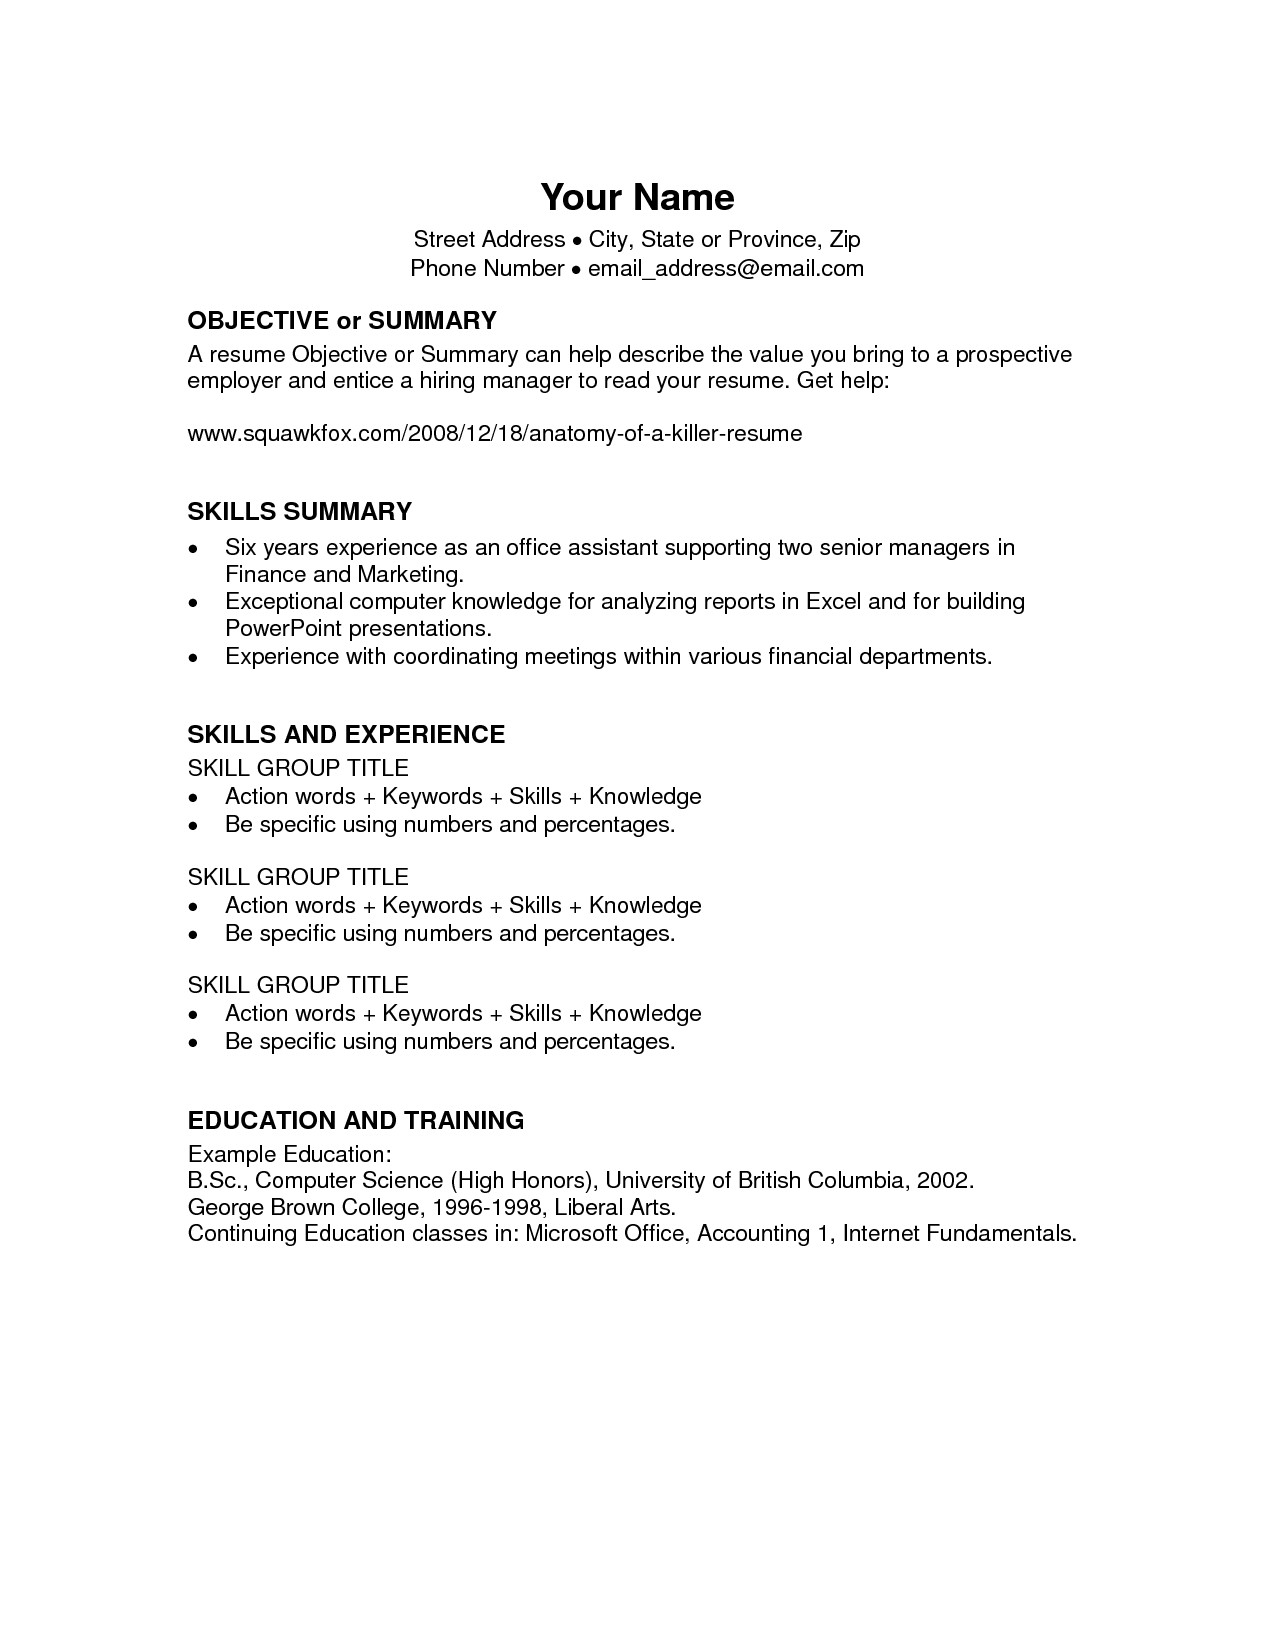 Microsoft Office Templates Resume Microsoft Fice Resume Templates